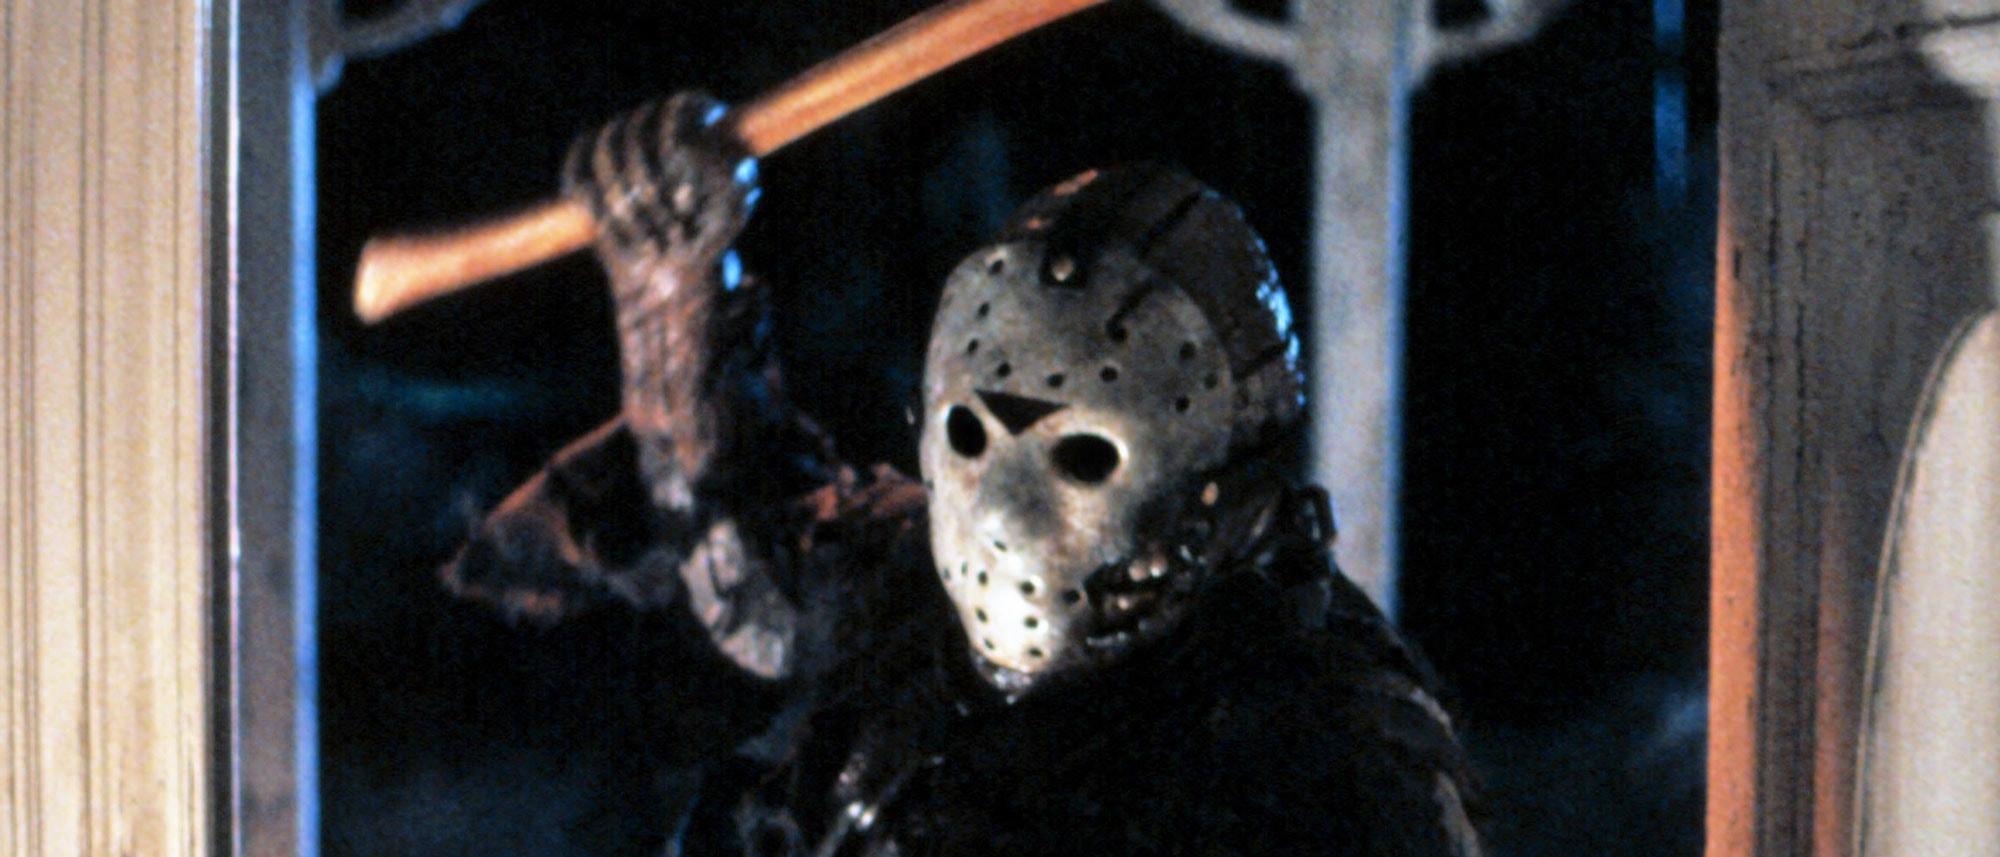 Jason Voorhees Friday The 13th Hugh Jackman